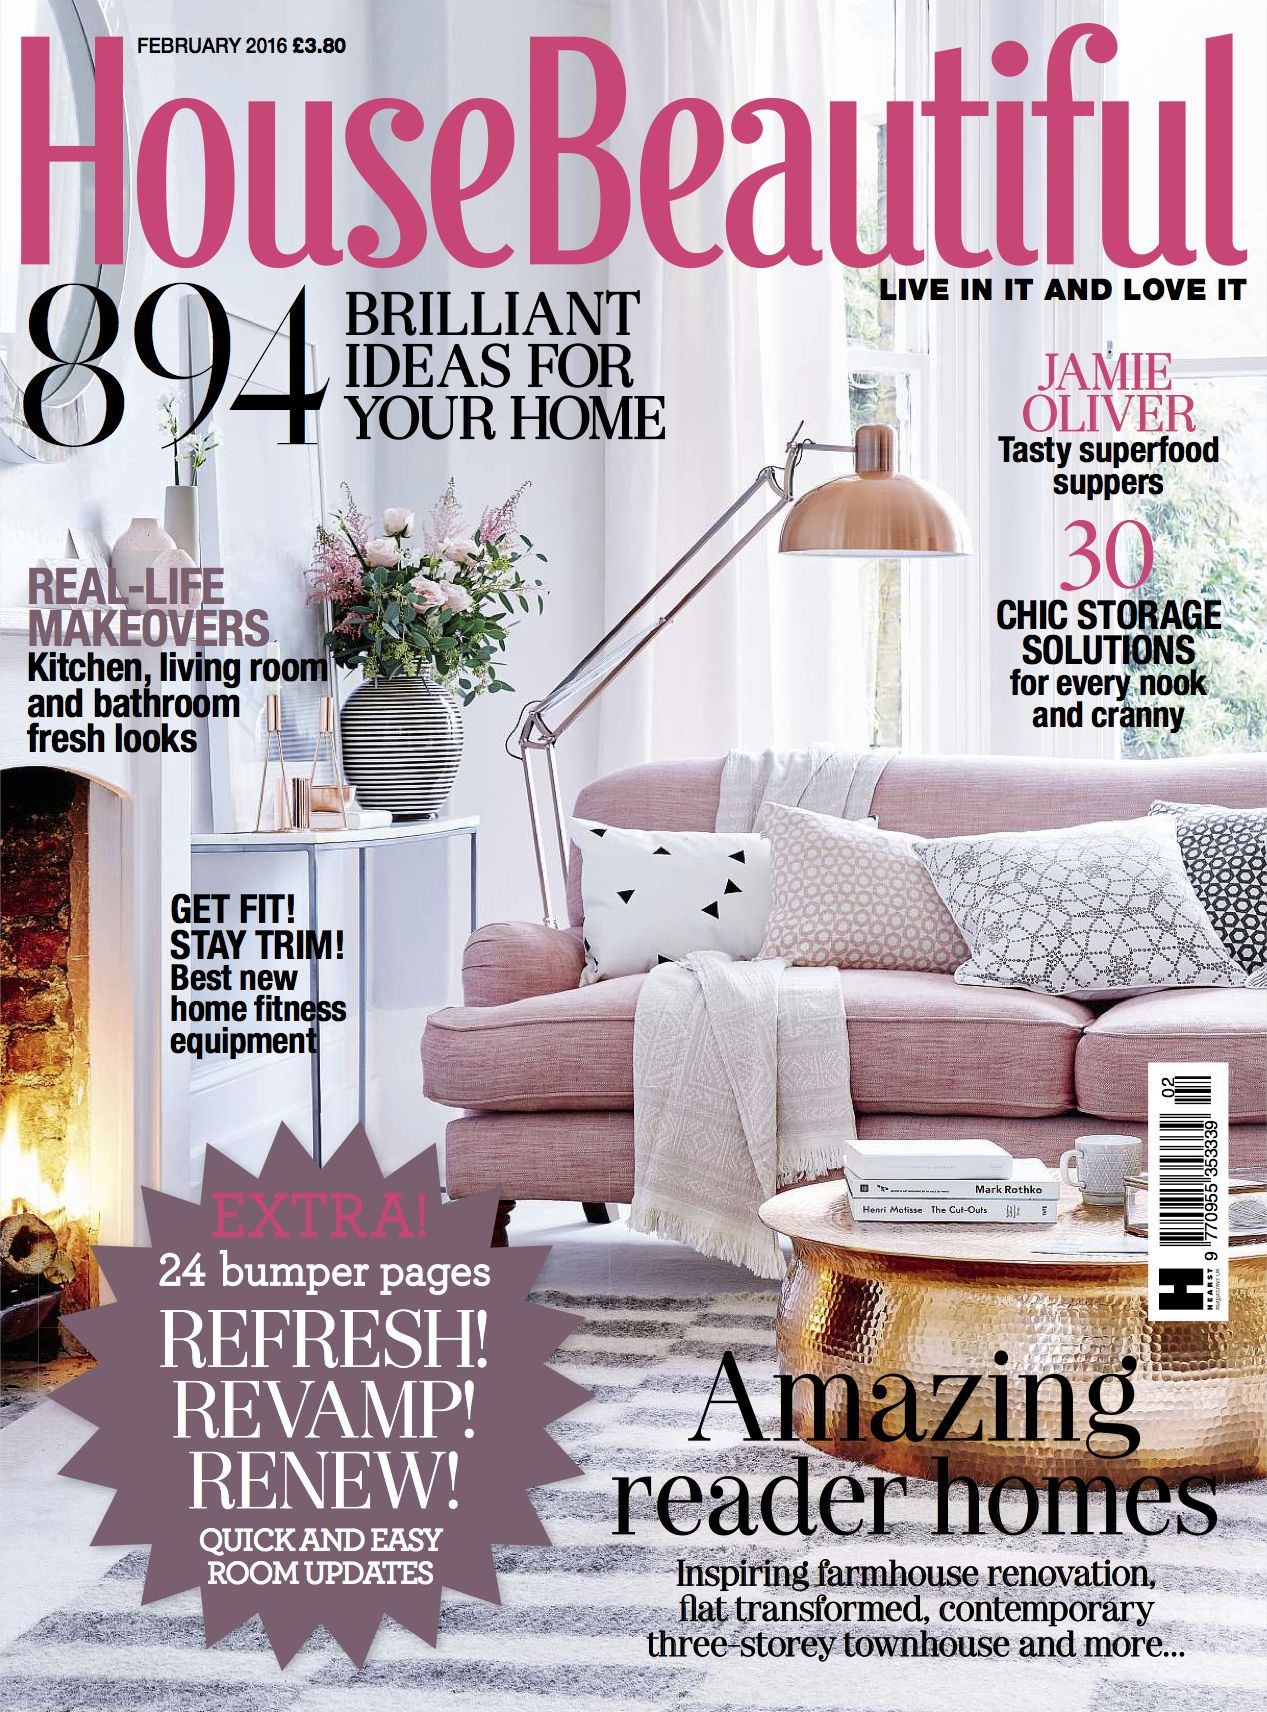 interior design magazine - house beautiful